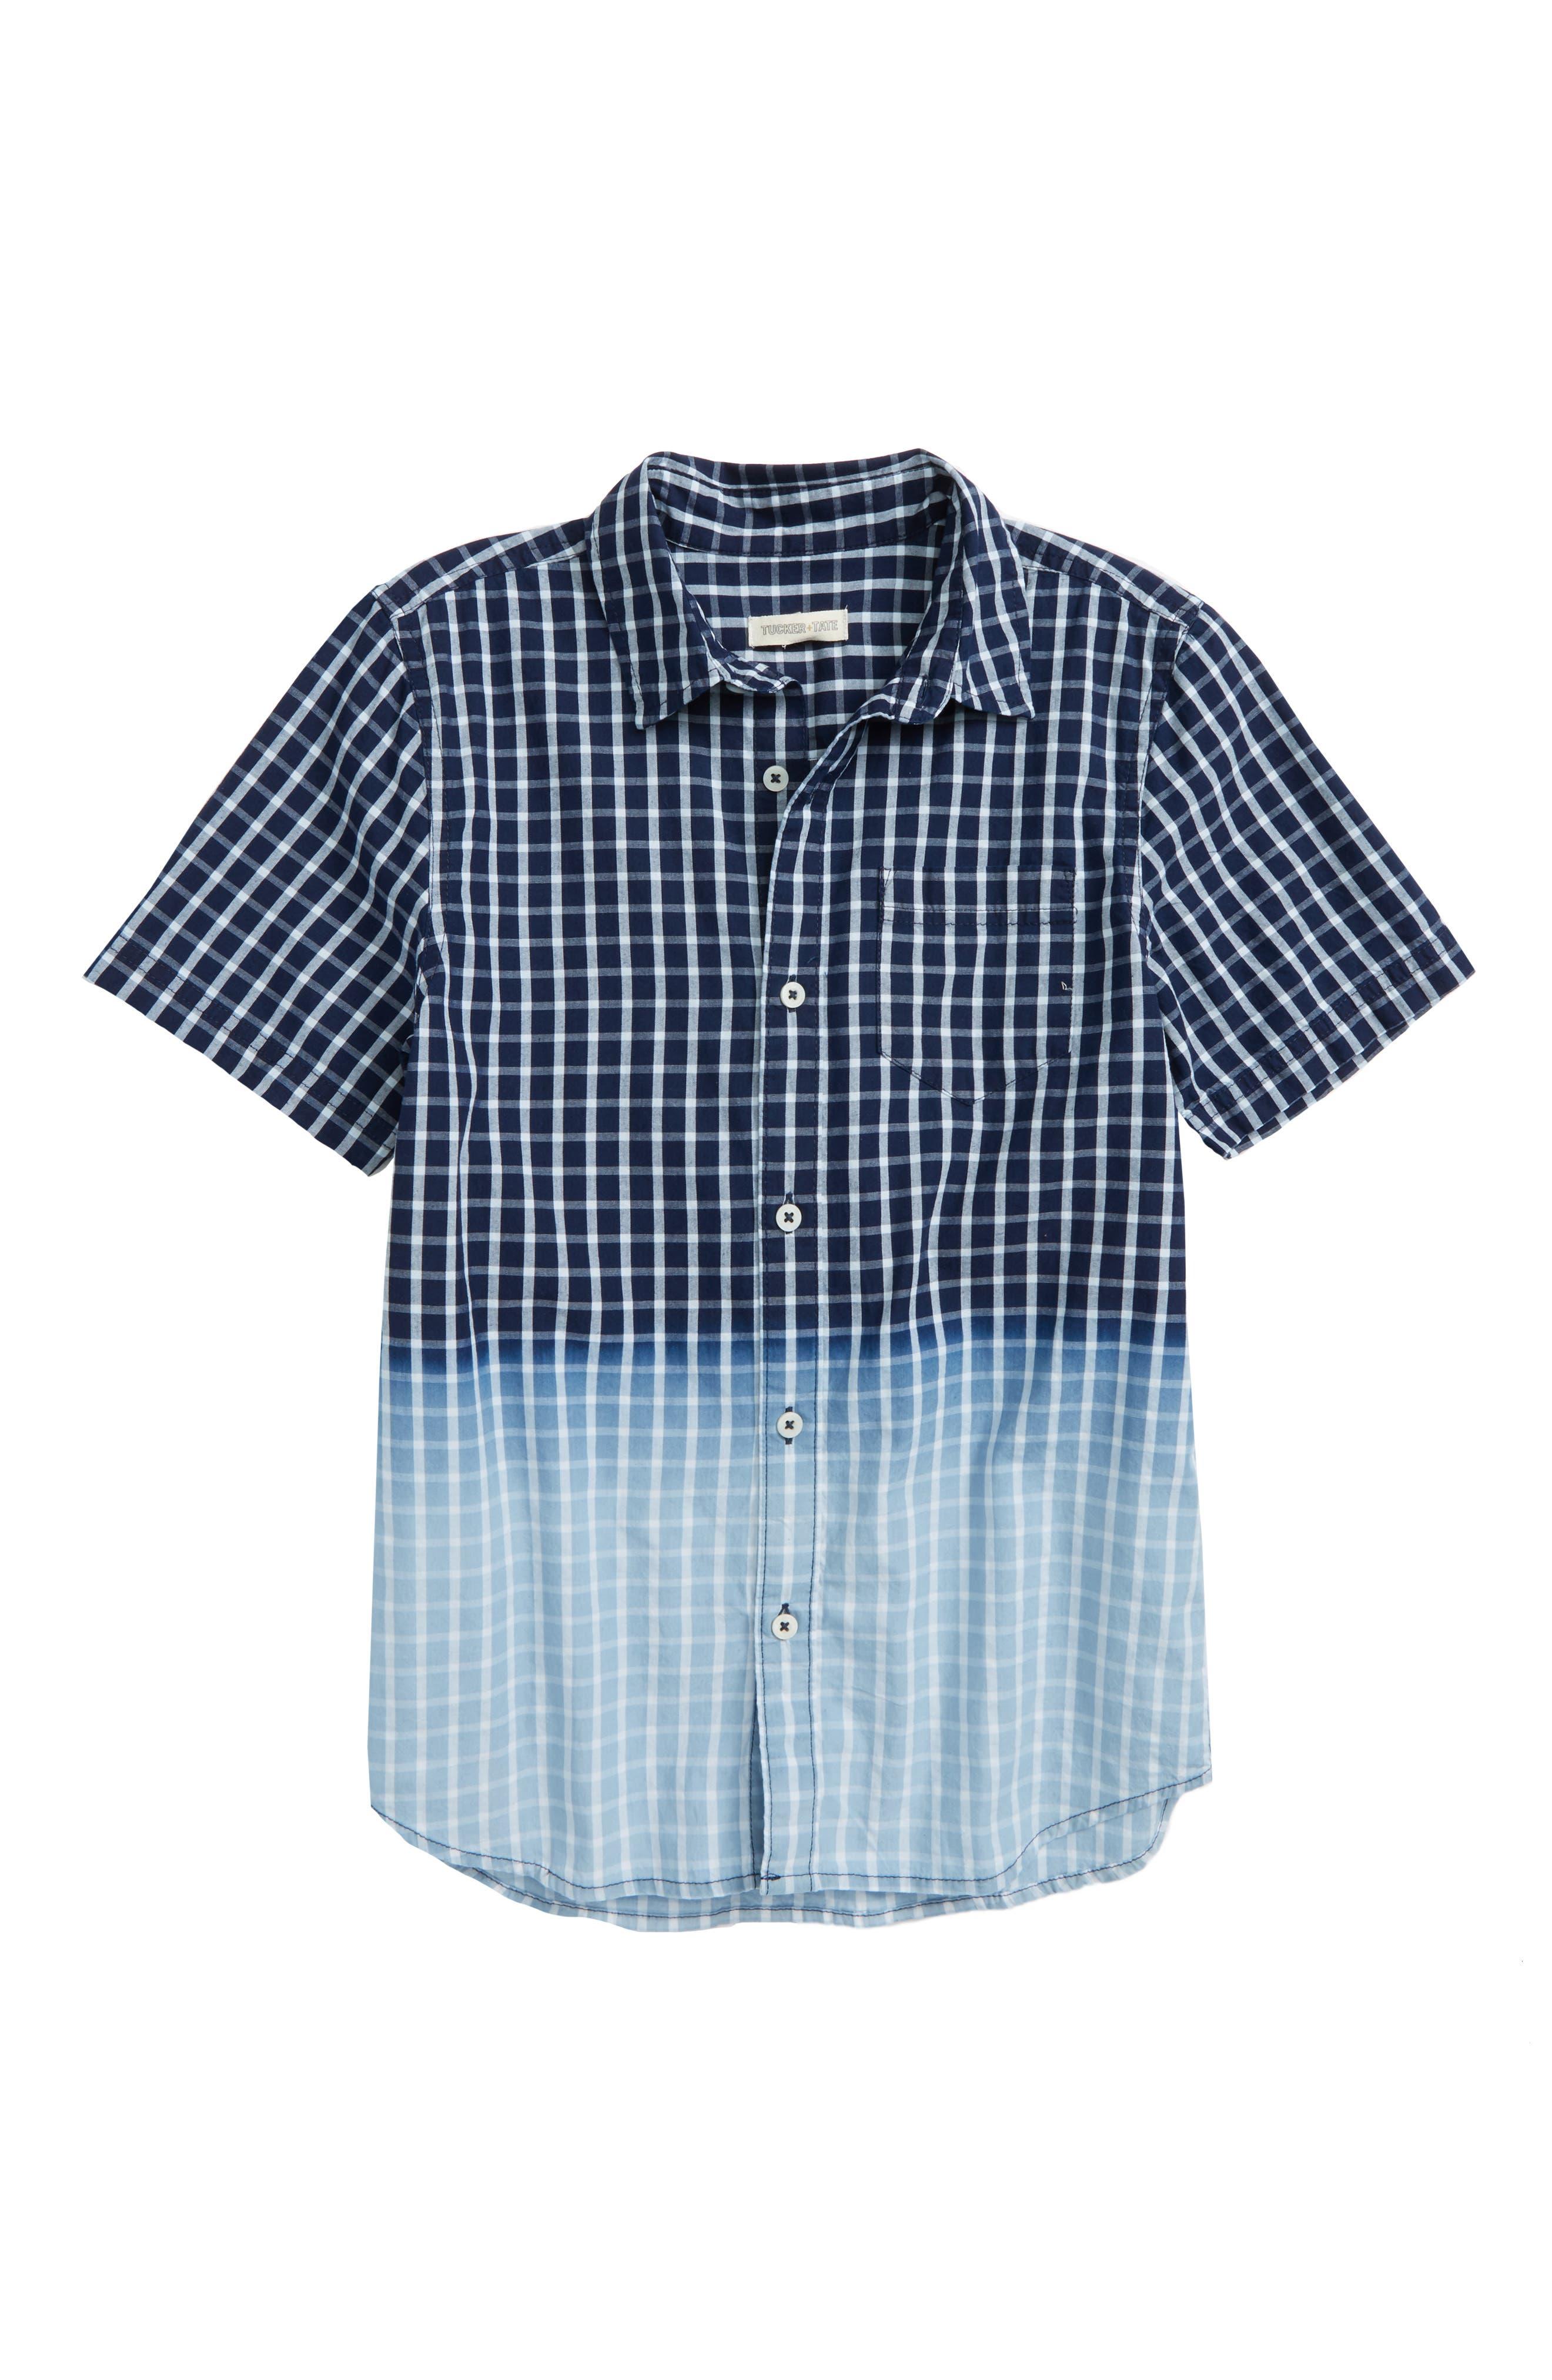 Dip Dye Check Shirt,                             Main thumbnail 1, color,                             Navy Denim Plaid